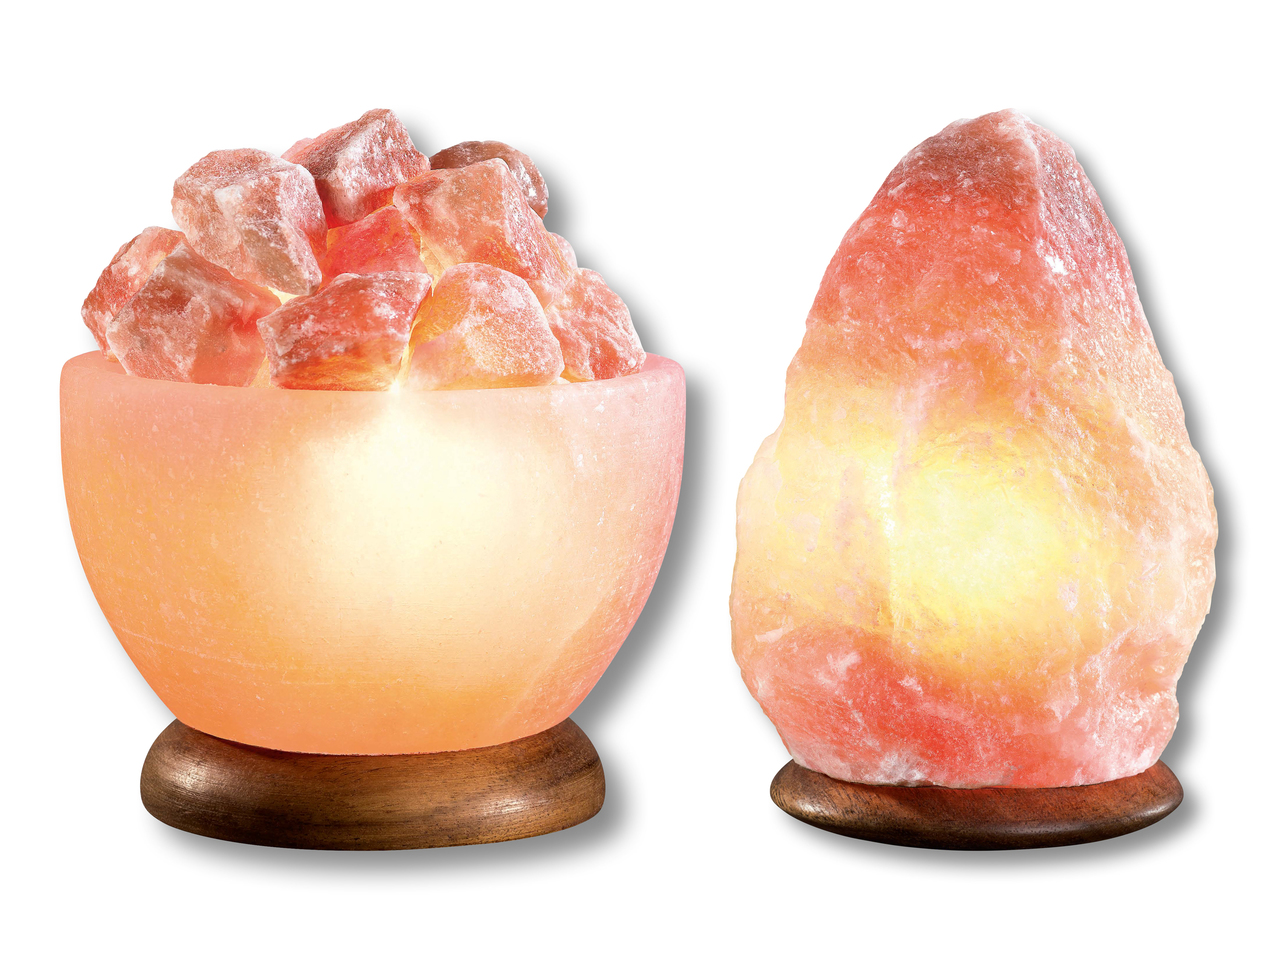 Lampade Cristallo Di Sale : Lampada ai cristalli di sale lidl u svizzera archivio offerte